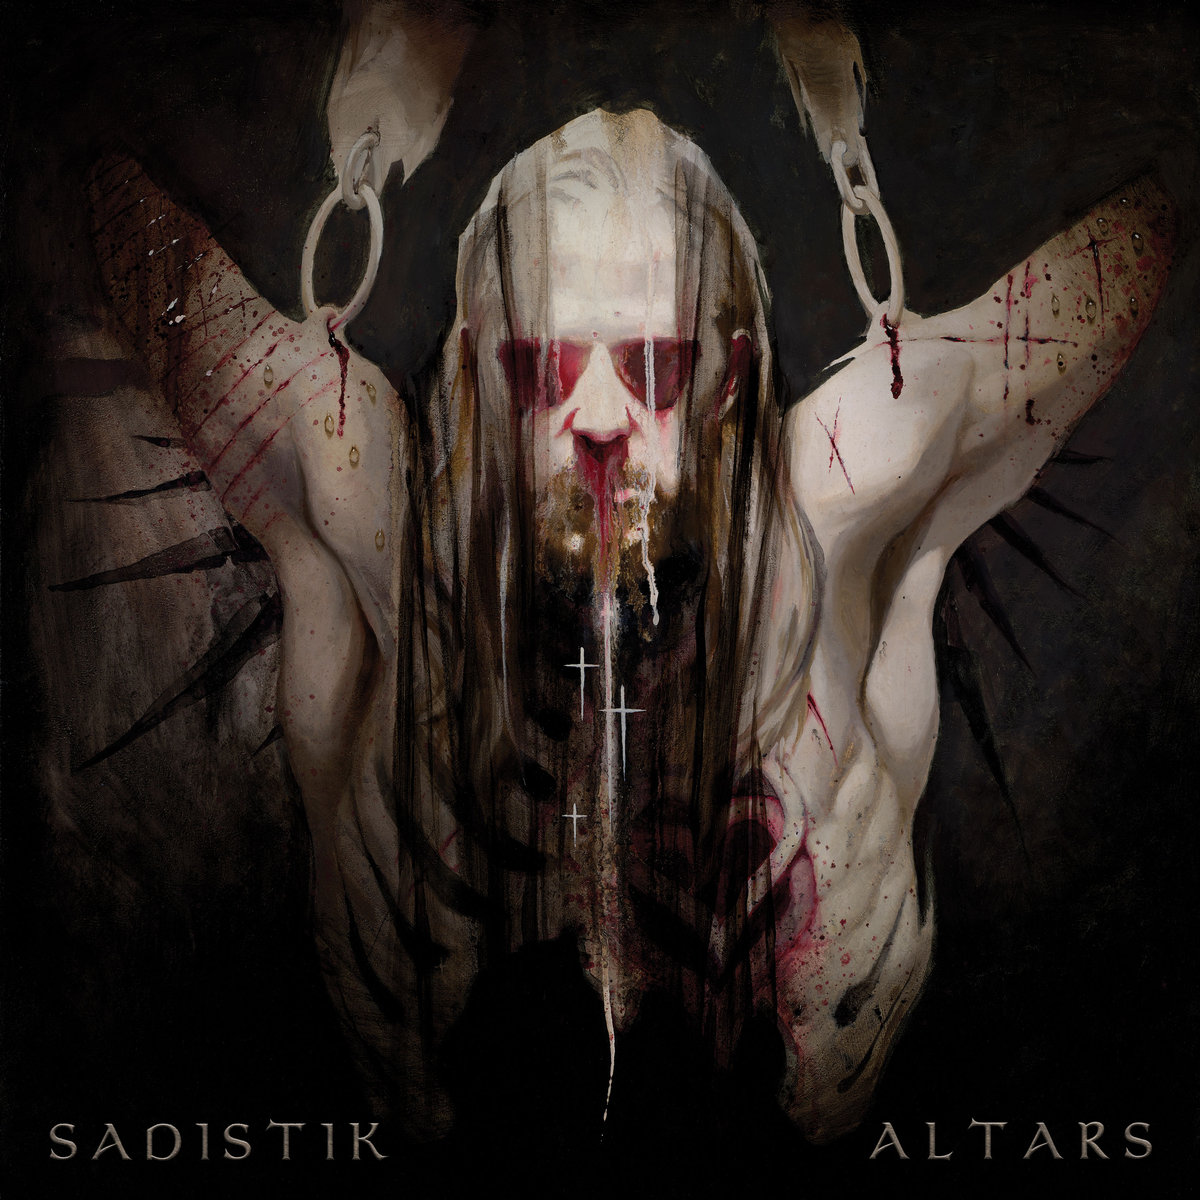 Sadistik – Altars